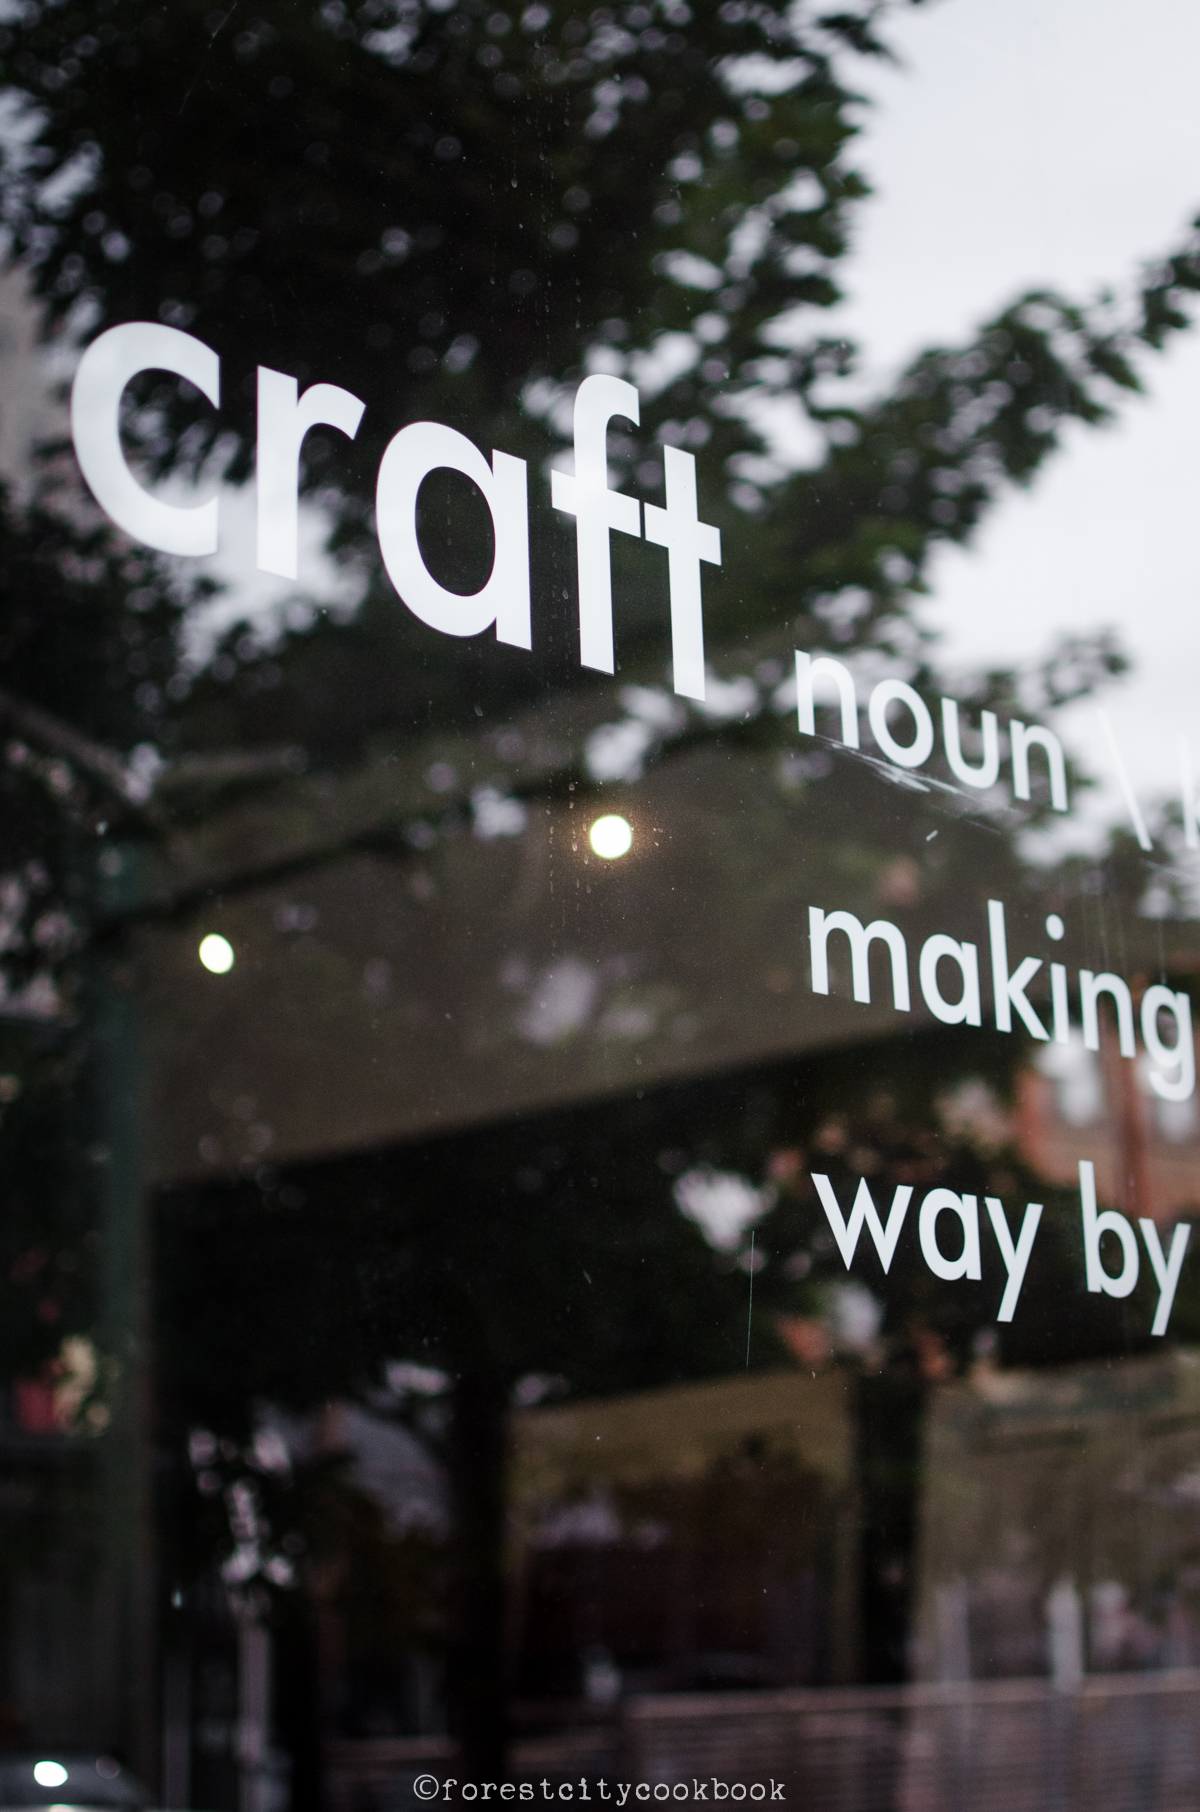 Forest City Cookbook - CMcKaskell Haindl Studio